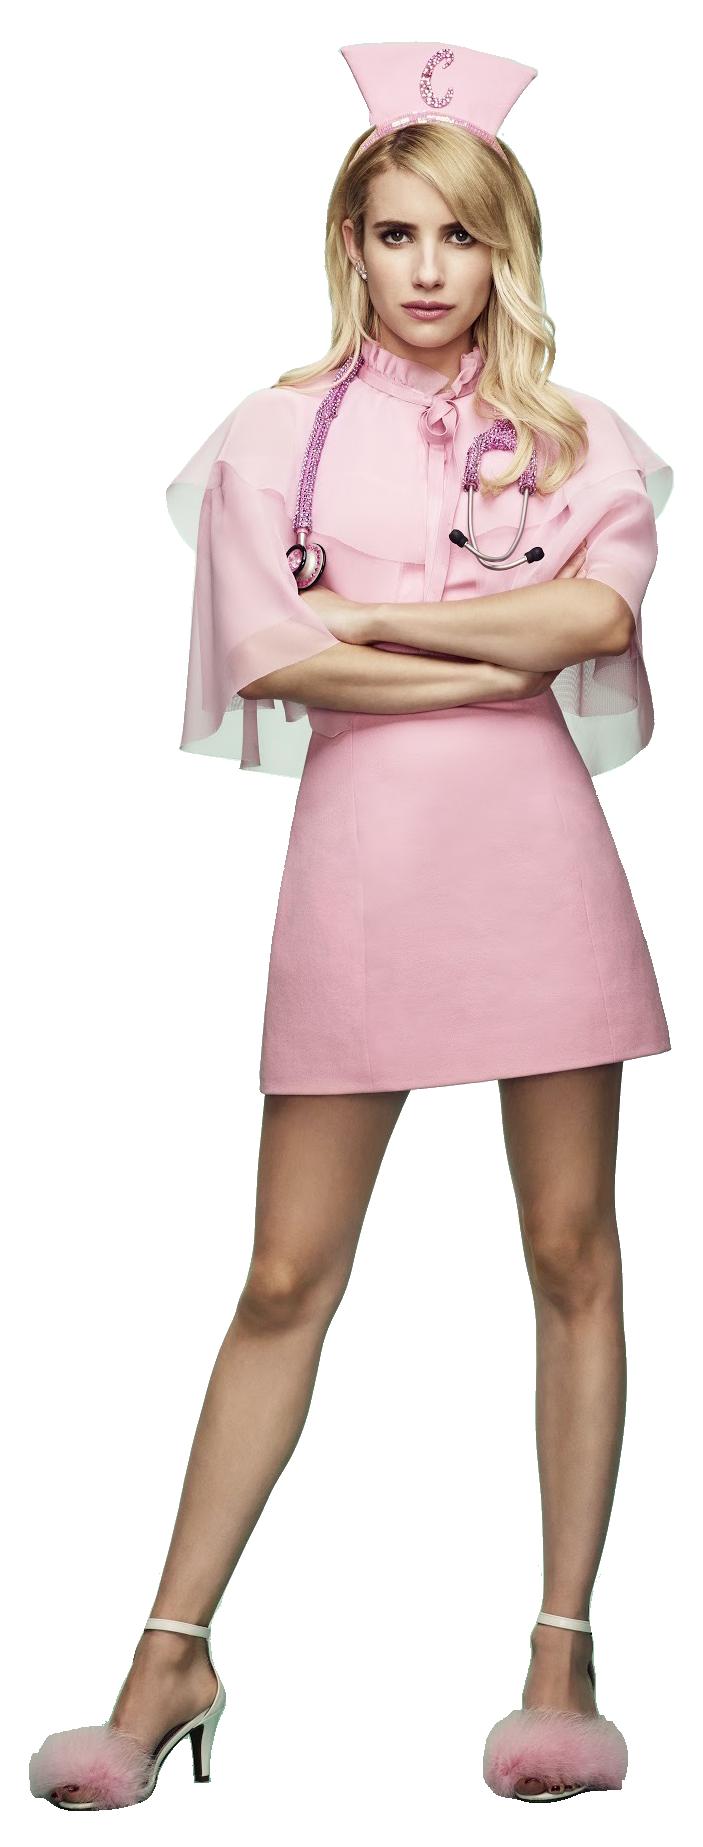 Emma Roberts Png By Maarcopngs On Deviantart